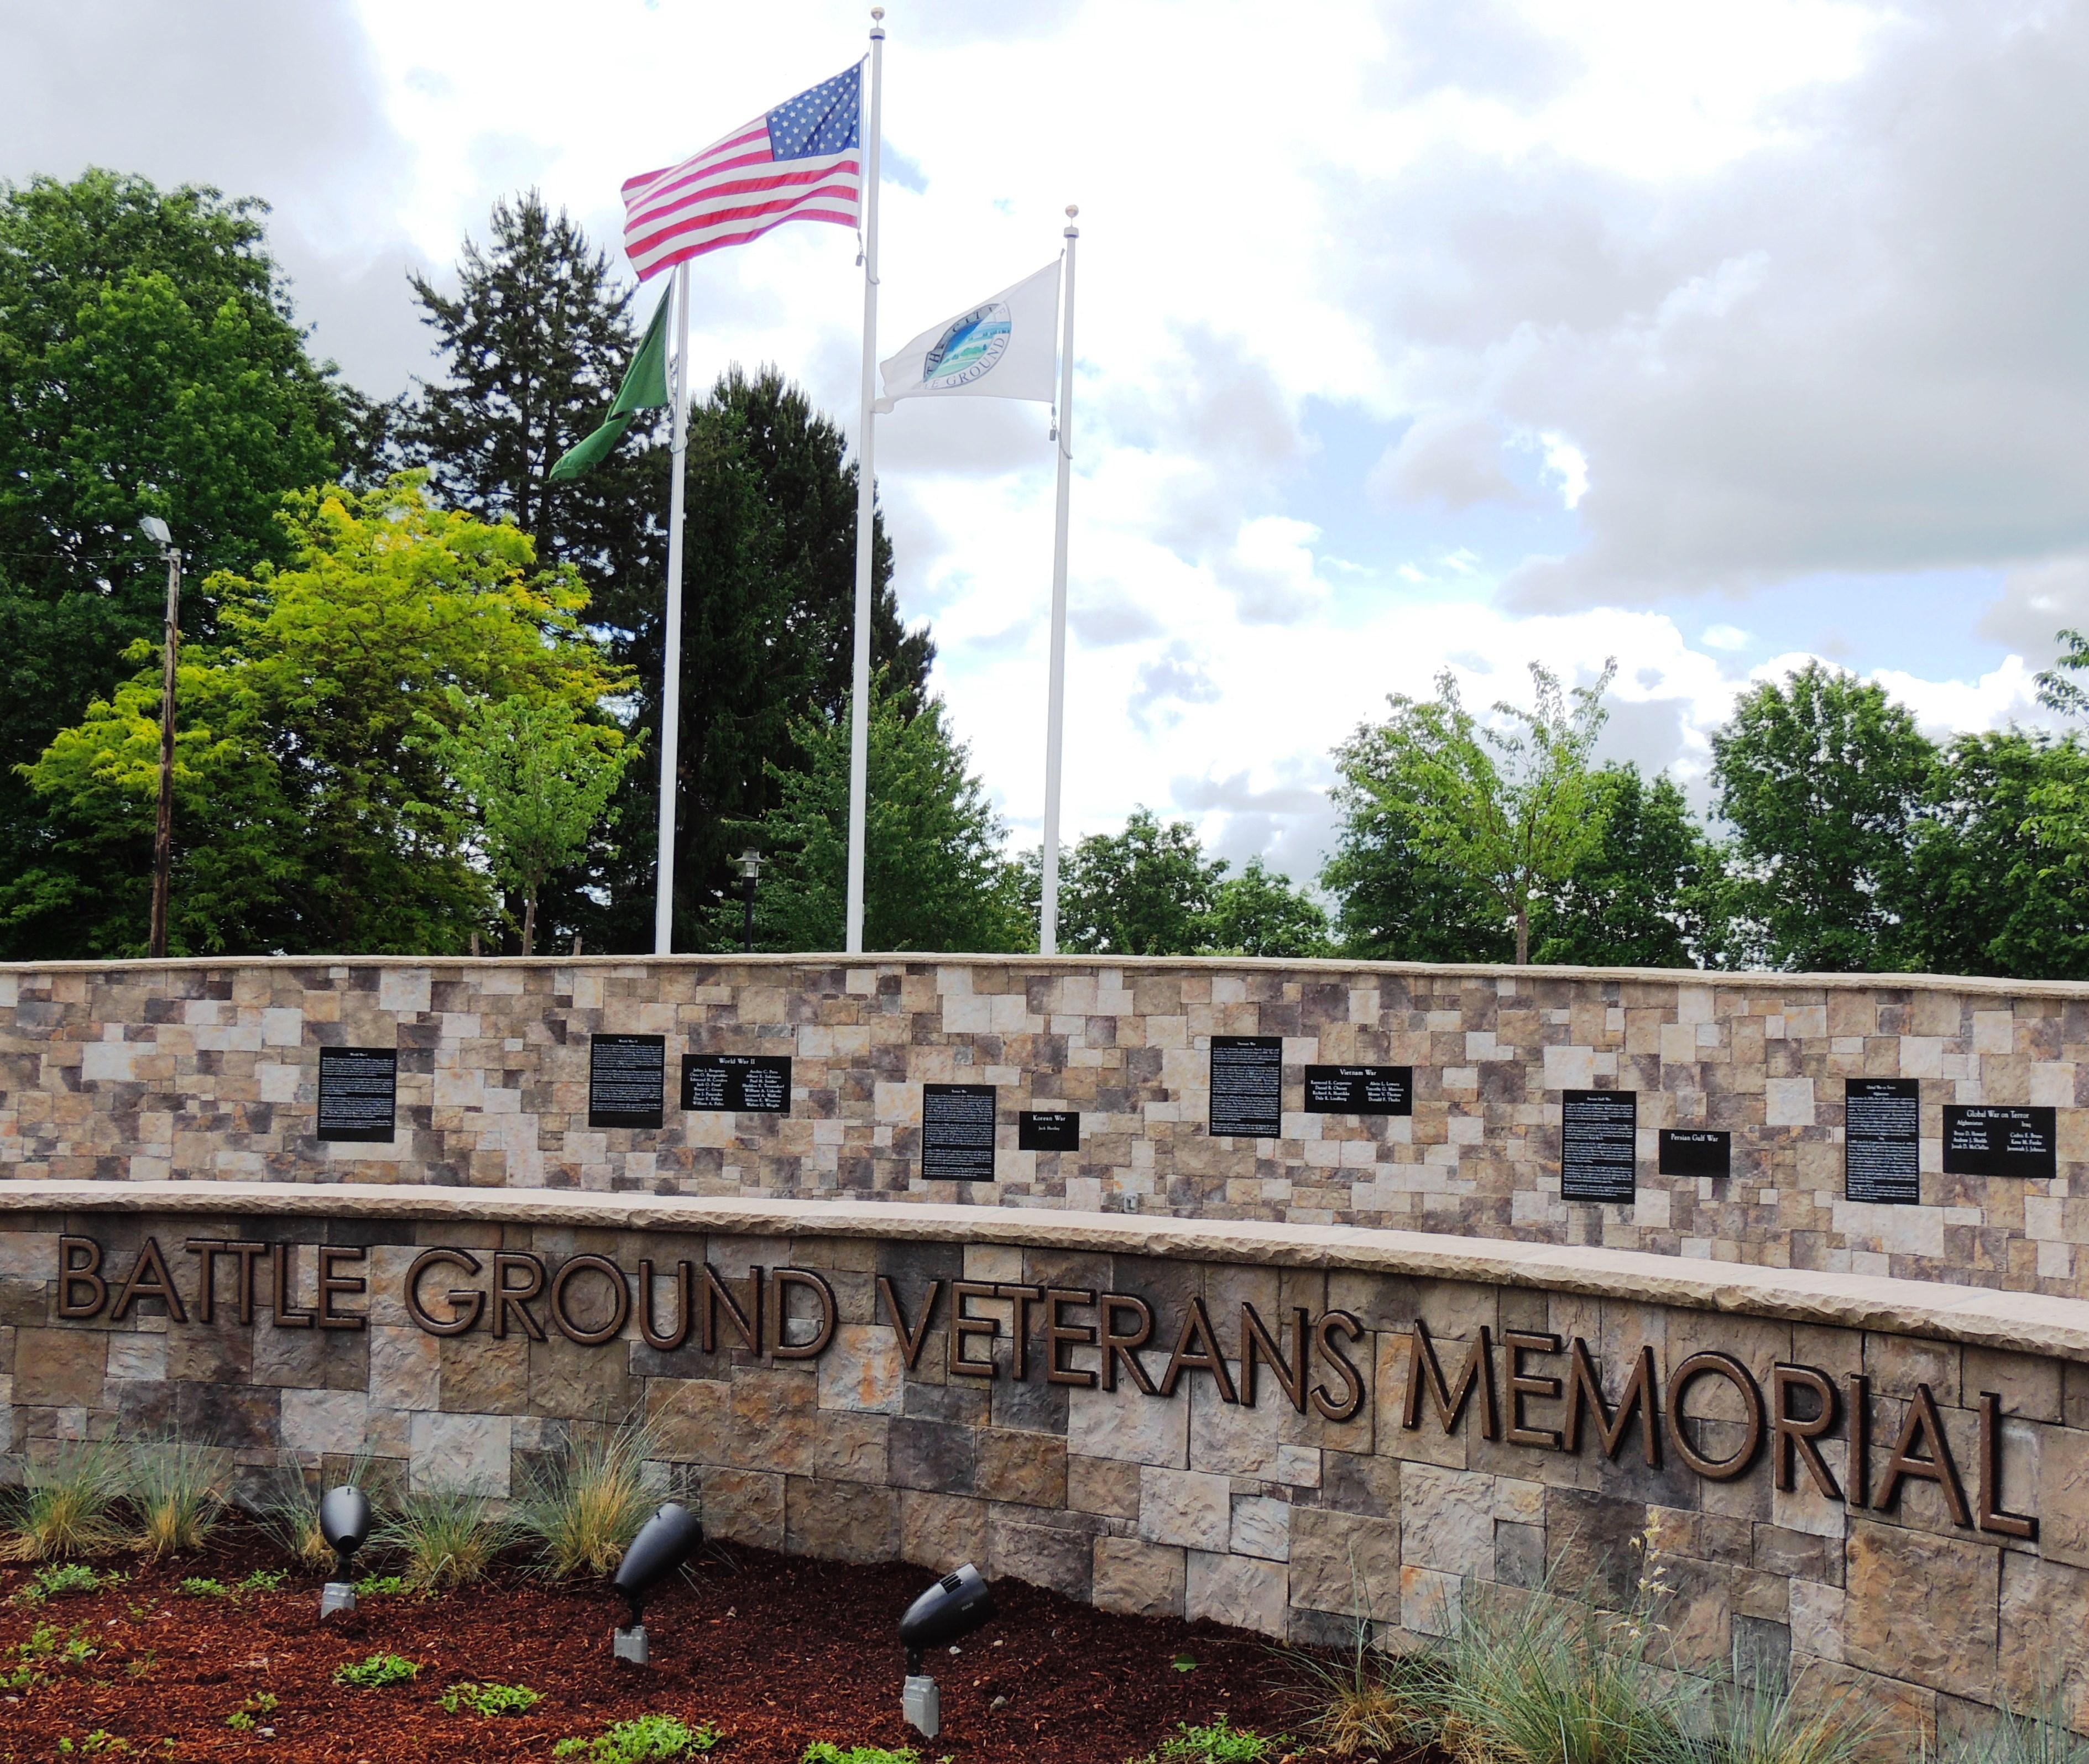 The Battle Ground Veteran's Memorial